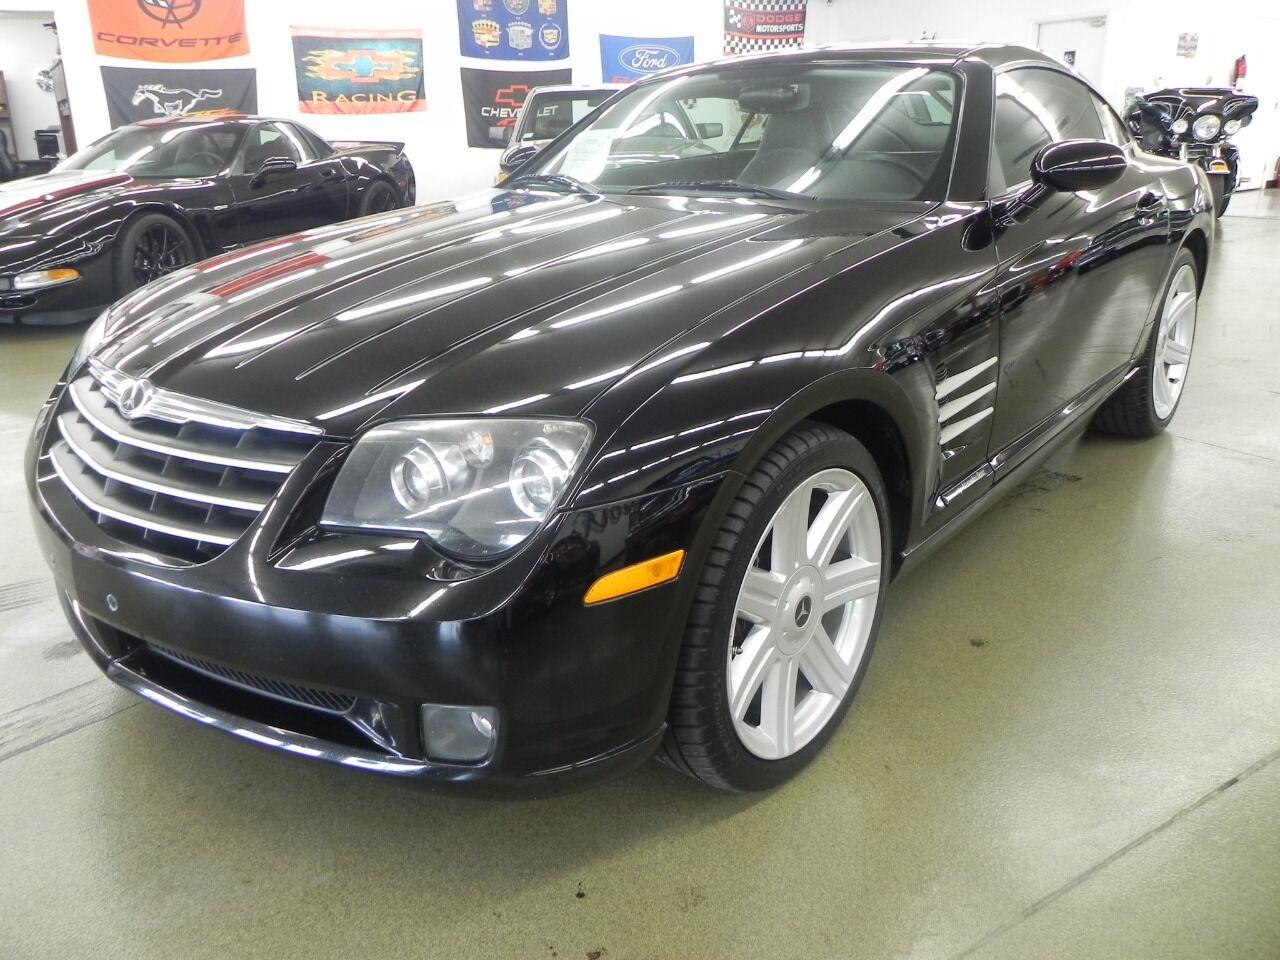 2007 Chrysler Crossfire photo